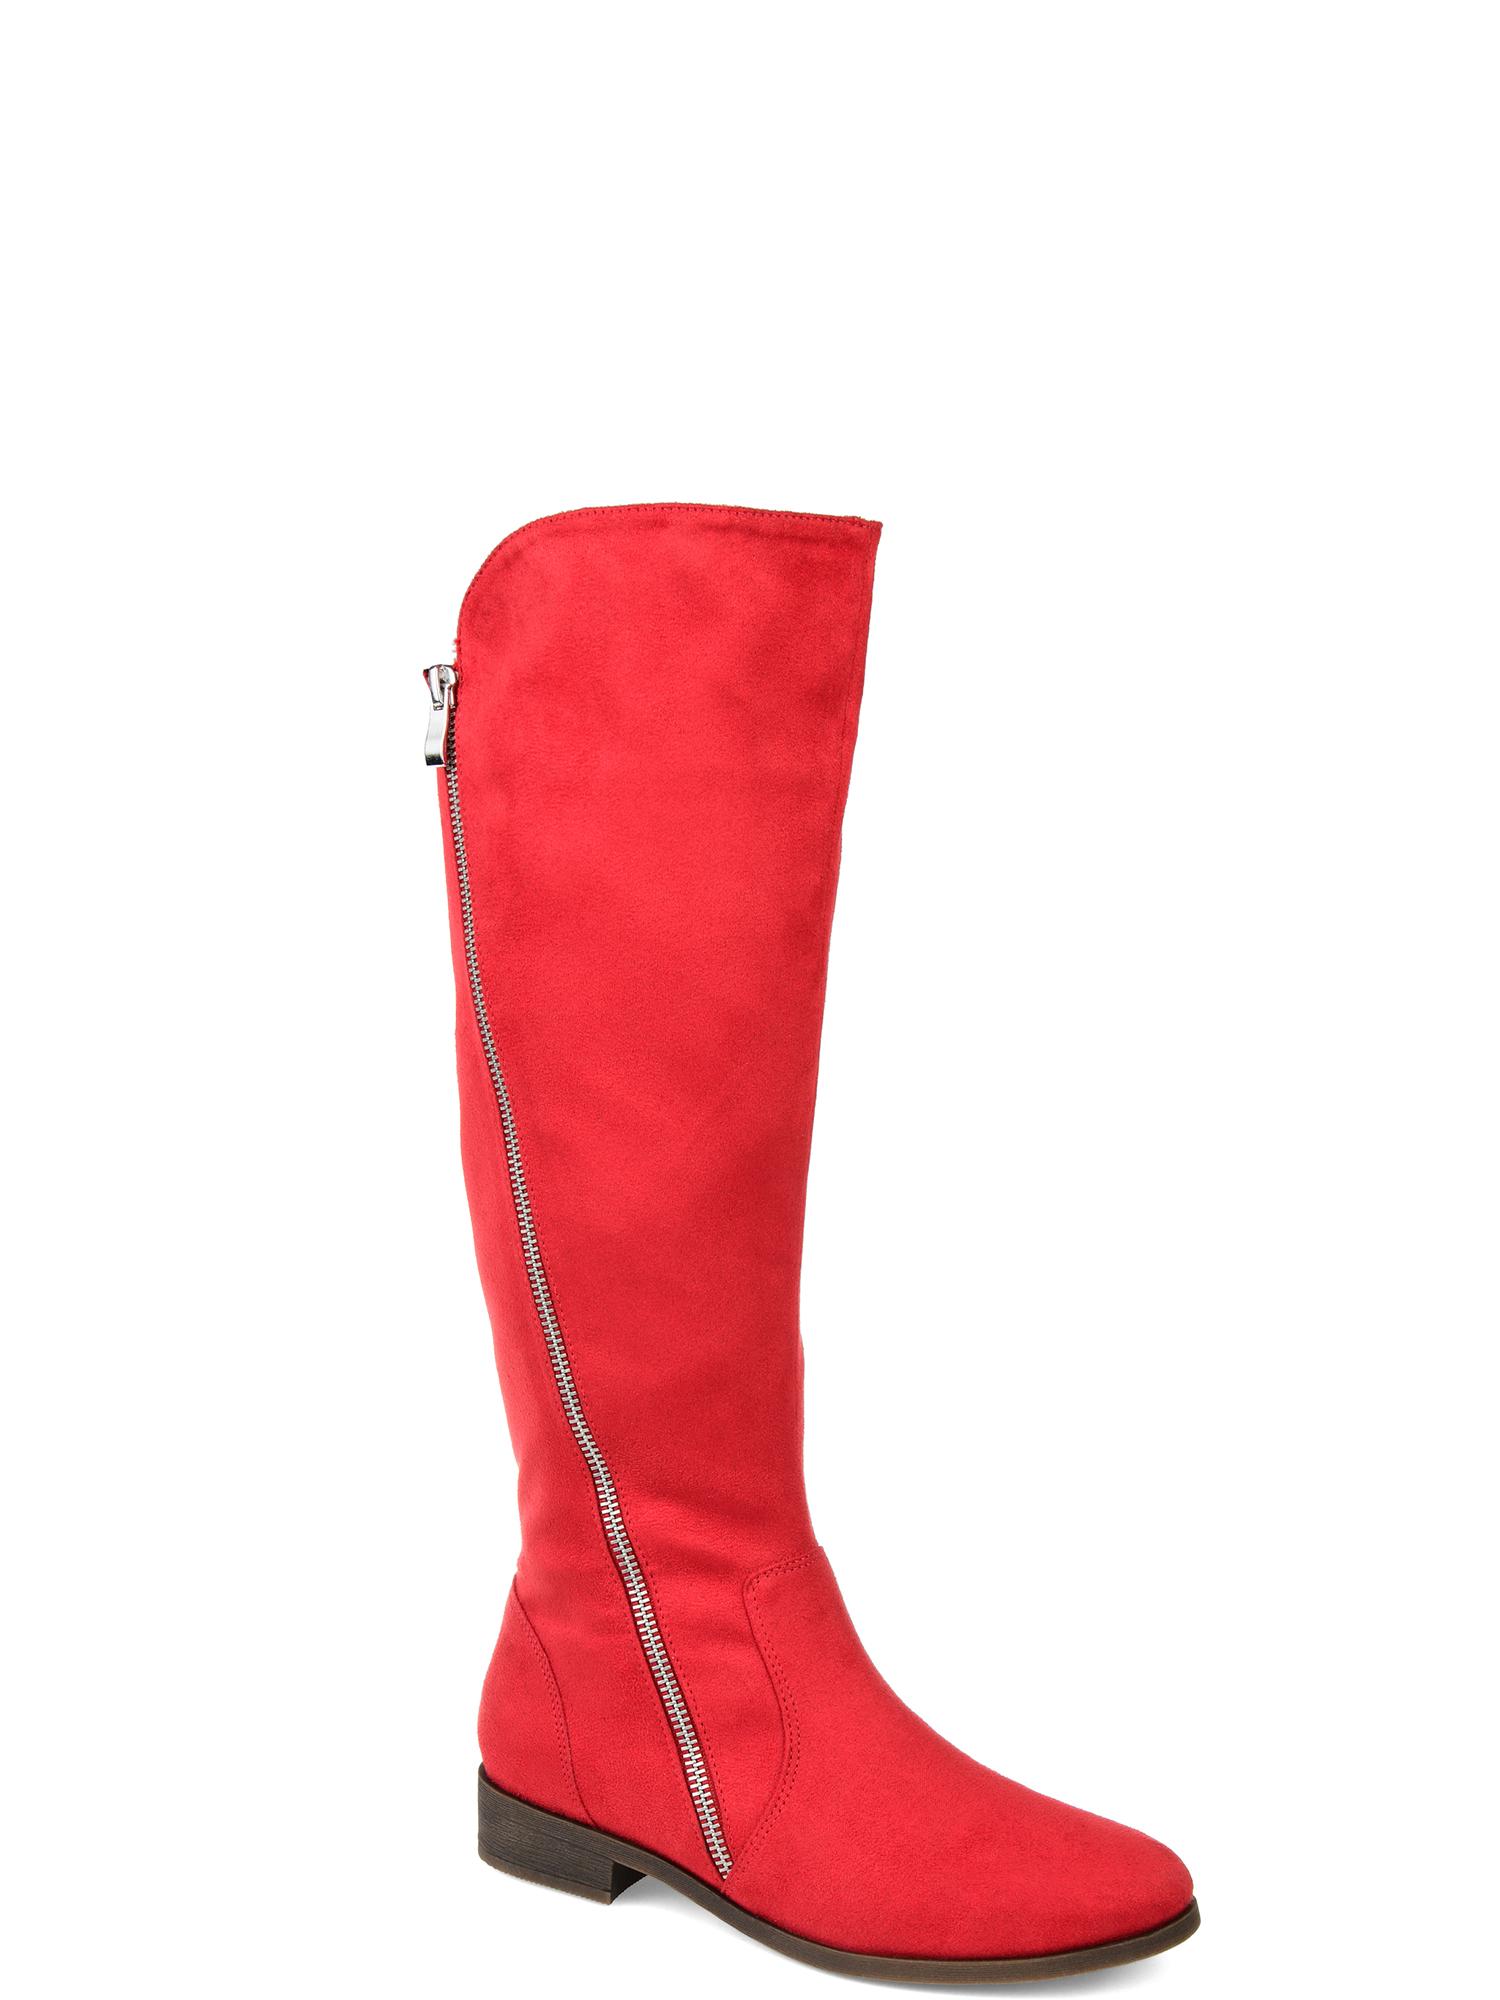 ee64922f0c6e Brinley Co. Womens Comfort Wide Calf Faux Suede Riding Boot - Walmart.com